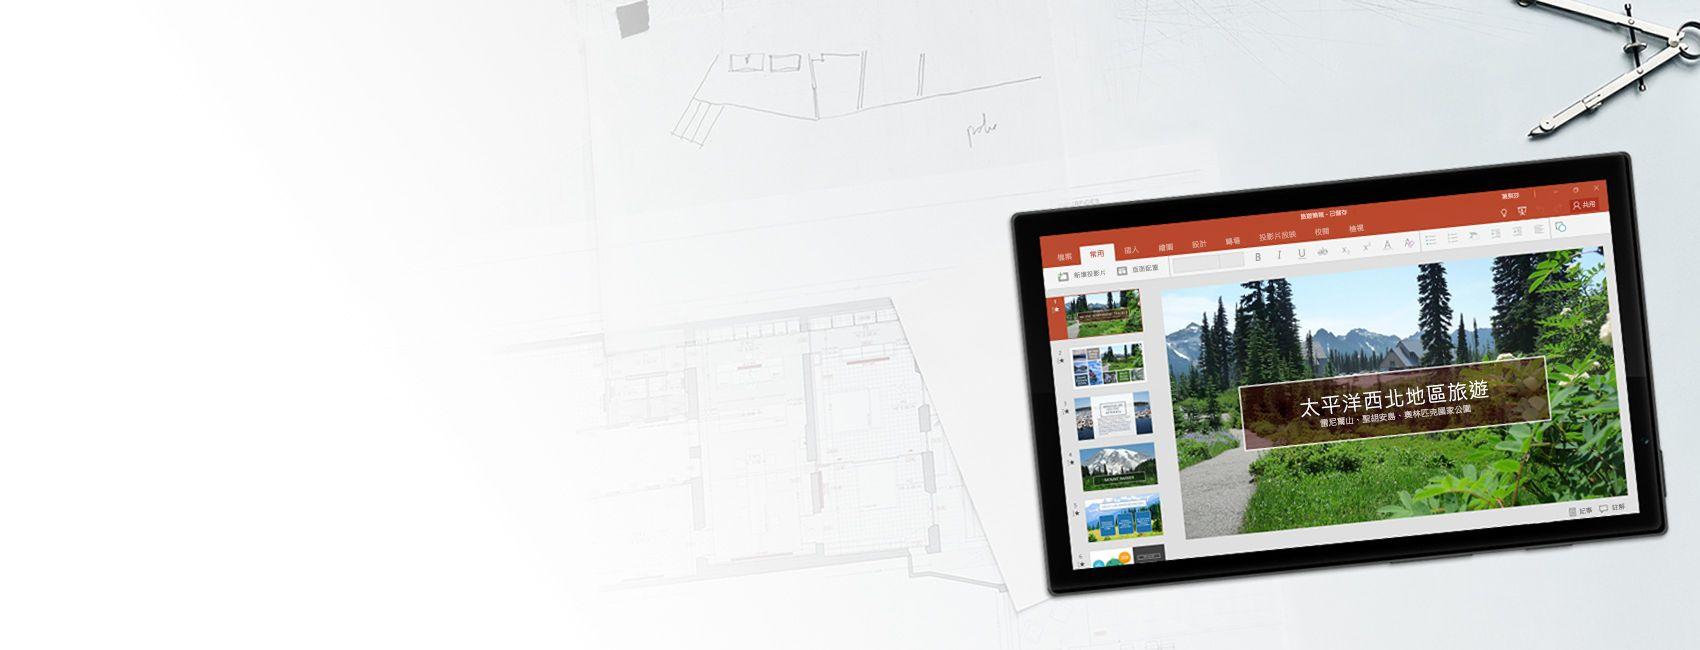 Windows 平板電腦顯示 Windows 10 行動裝置版 PowerPoint 中,有一份關於西北太平洋地區旅遊的 PowerPoint 簡報